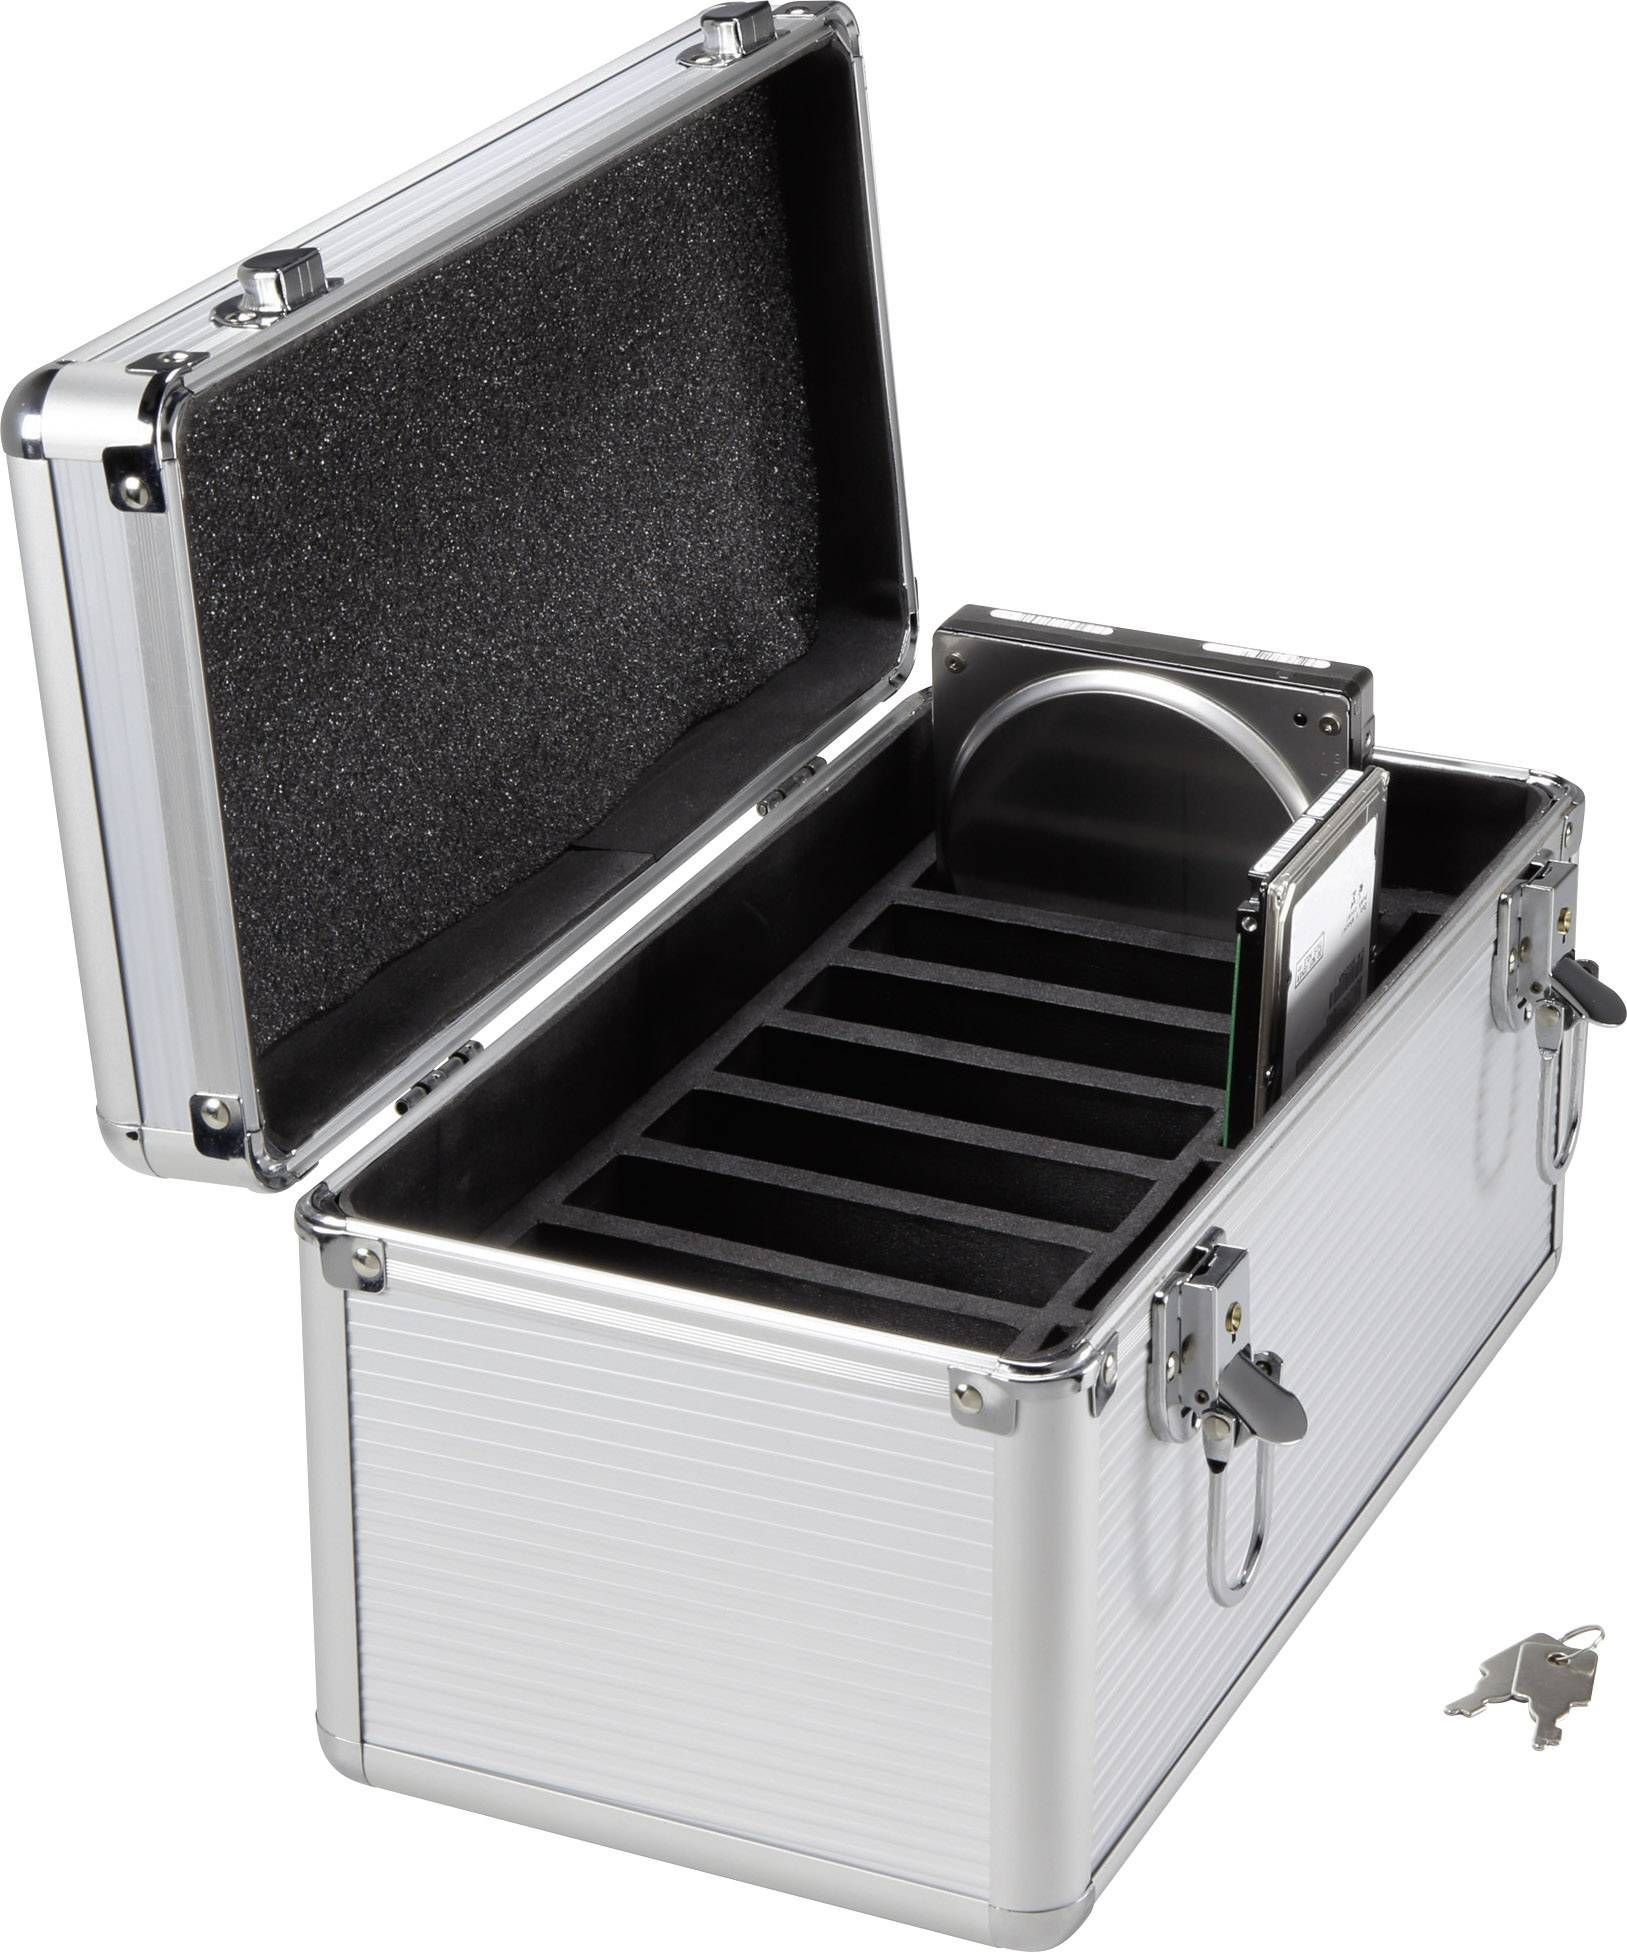 "Kufrík na pevné disky Renkforce, HDB-101, 3,5 "", 310 x 160 x 160 mm"